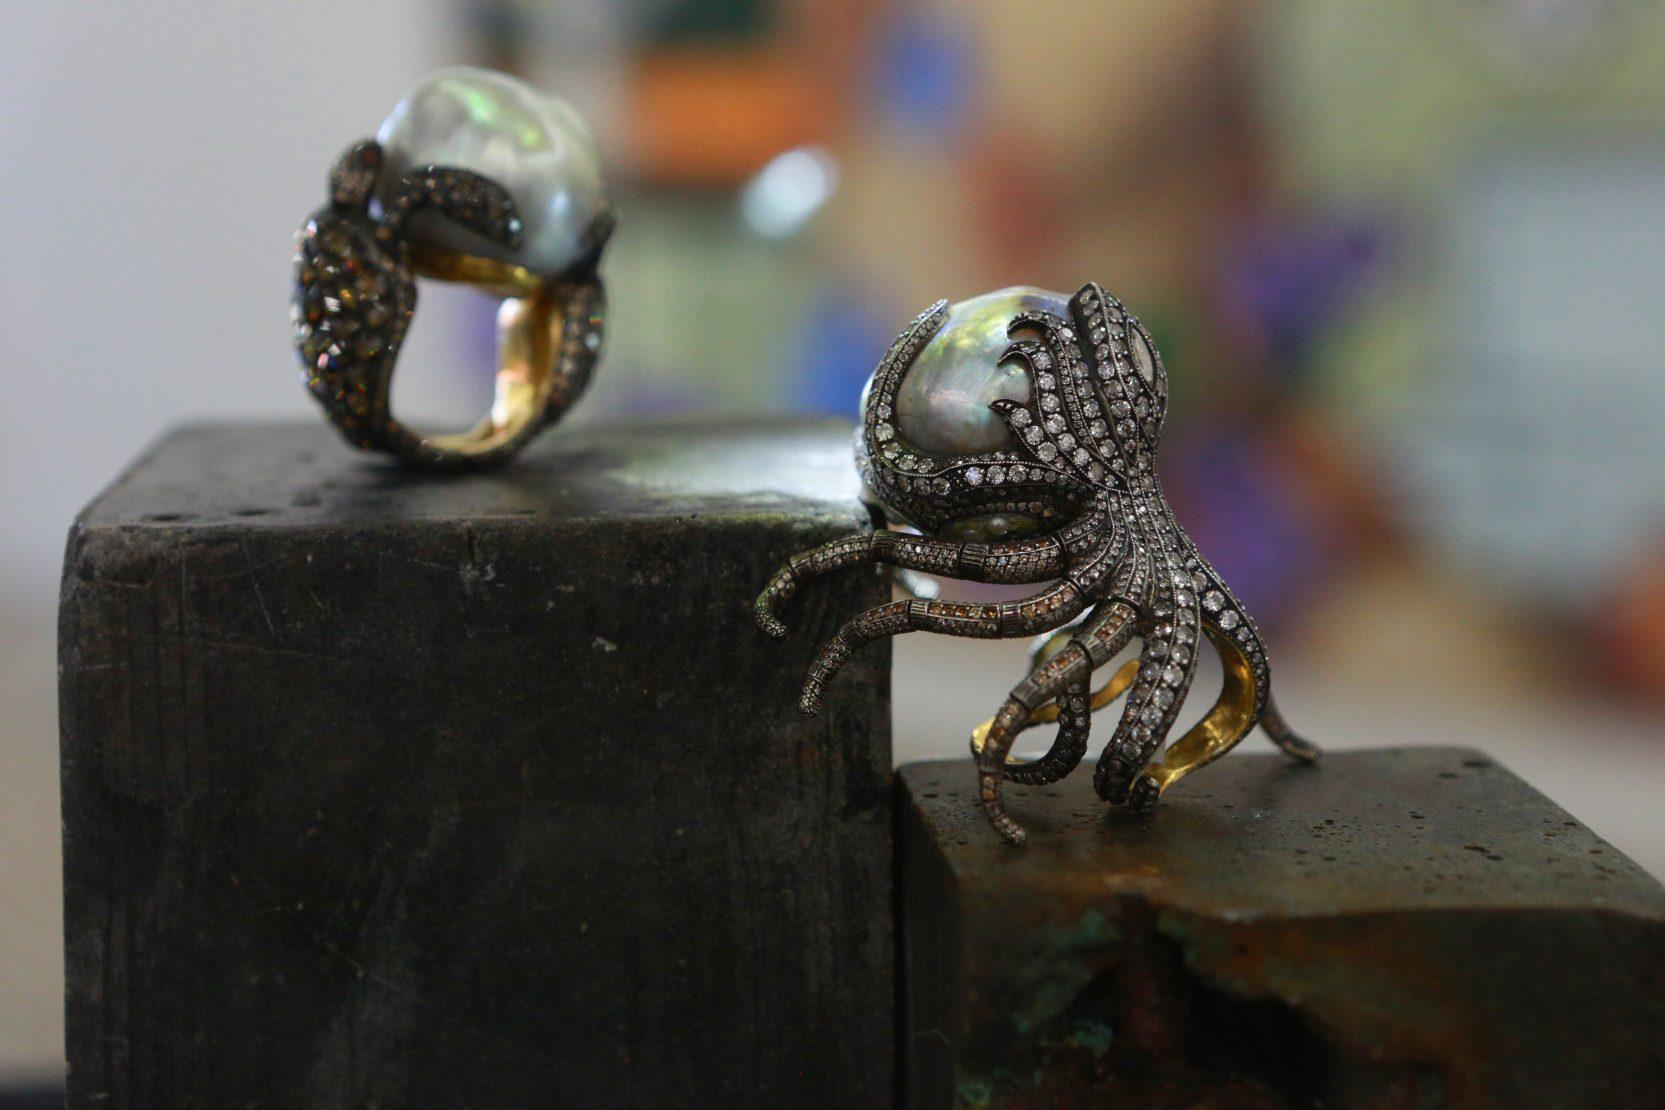 Sevan Bicacki rings